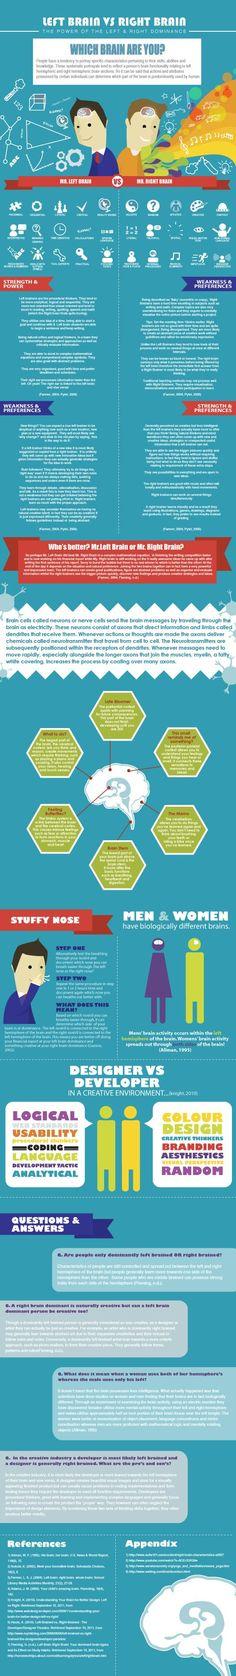 LEFT BRAIN VS RIGHT BRAIN - [Infographic] by Tania Chan, via Behance  #BrainSupplements www.BrainHealth.Rocks